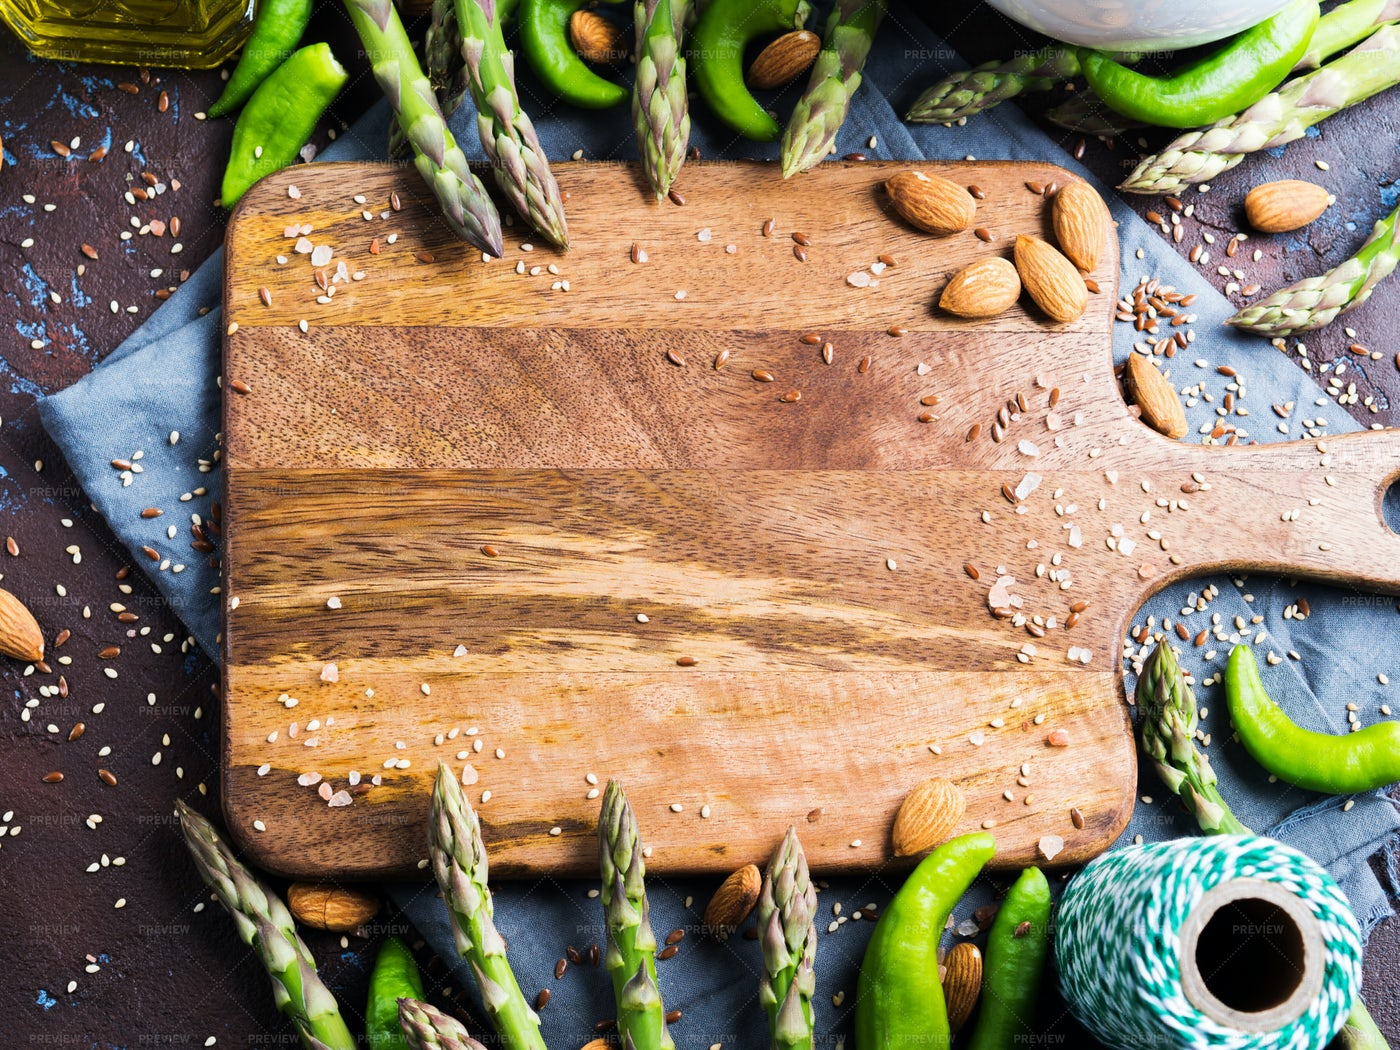 Chopping Board With Asparagus: Stock Photos